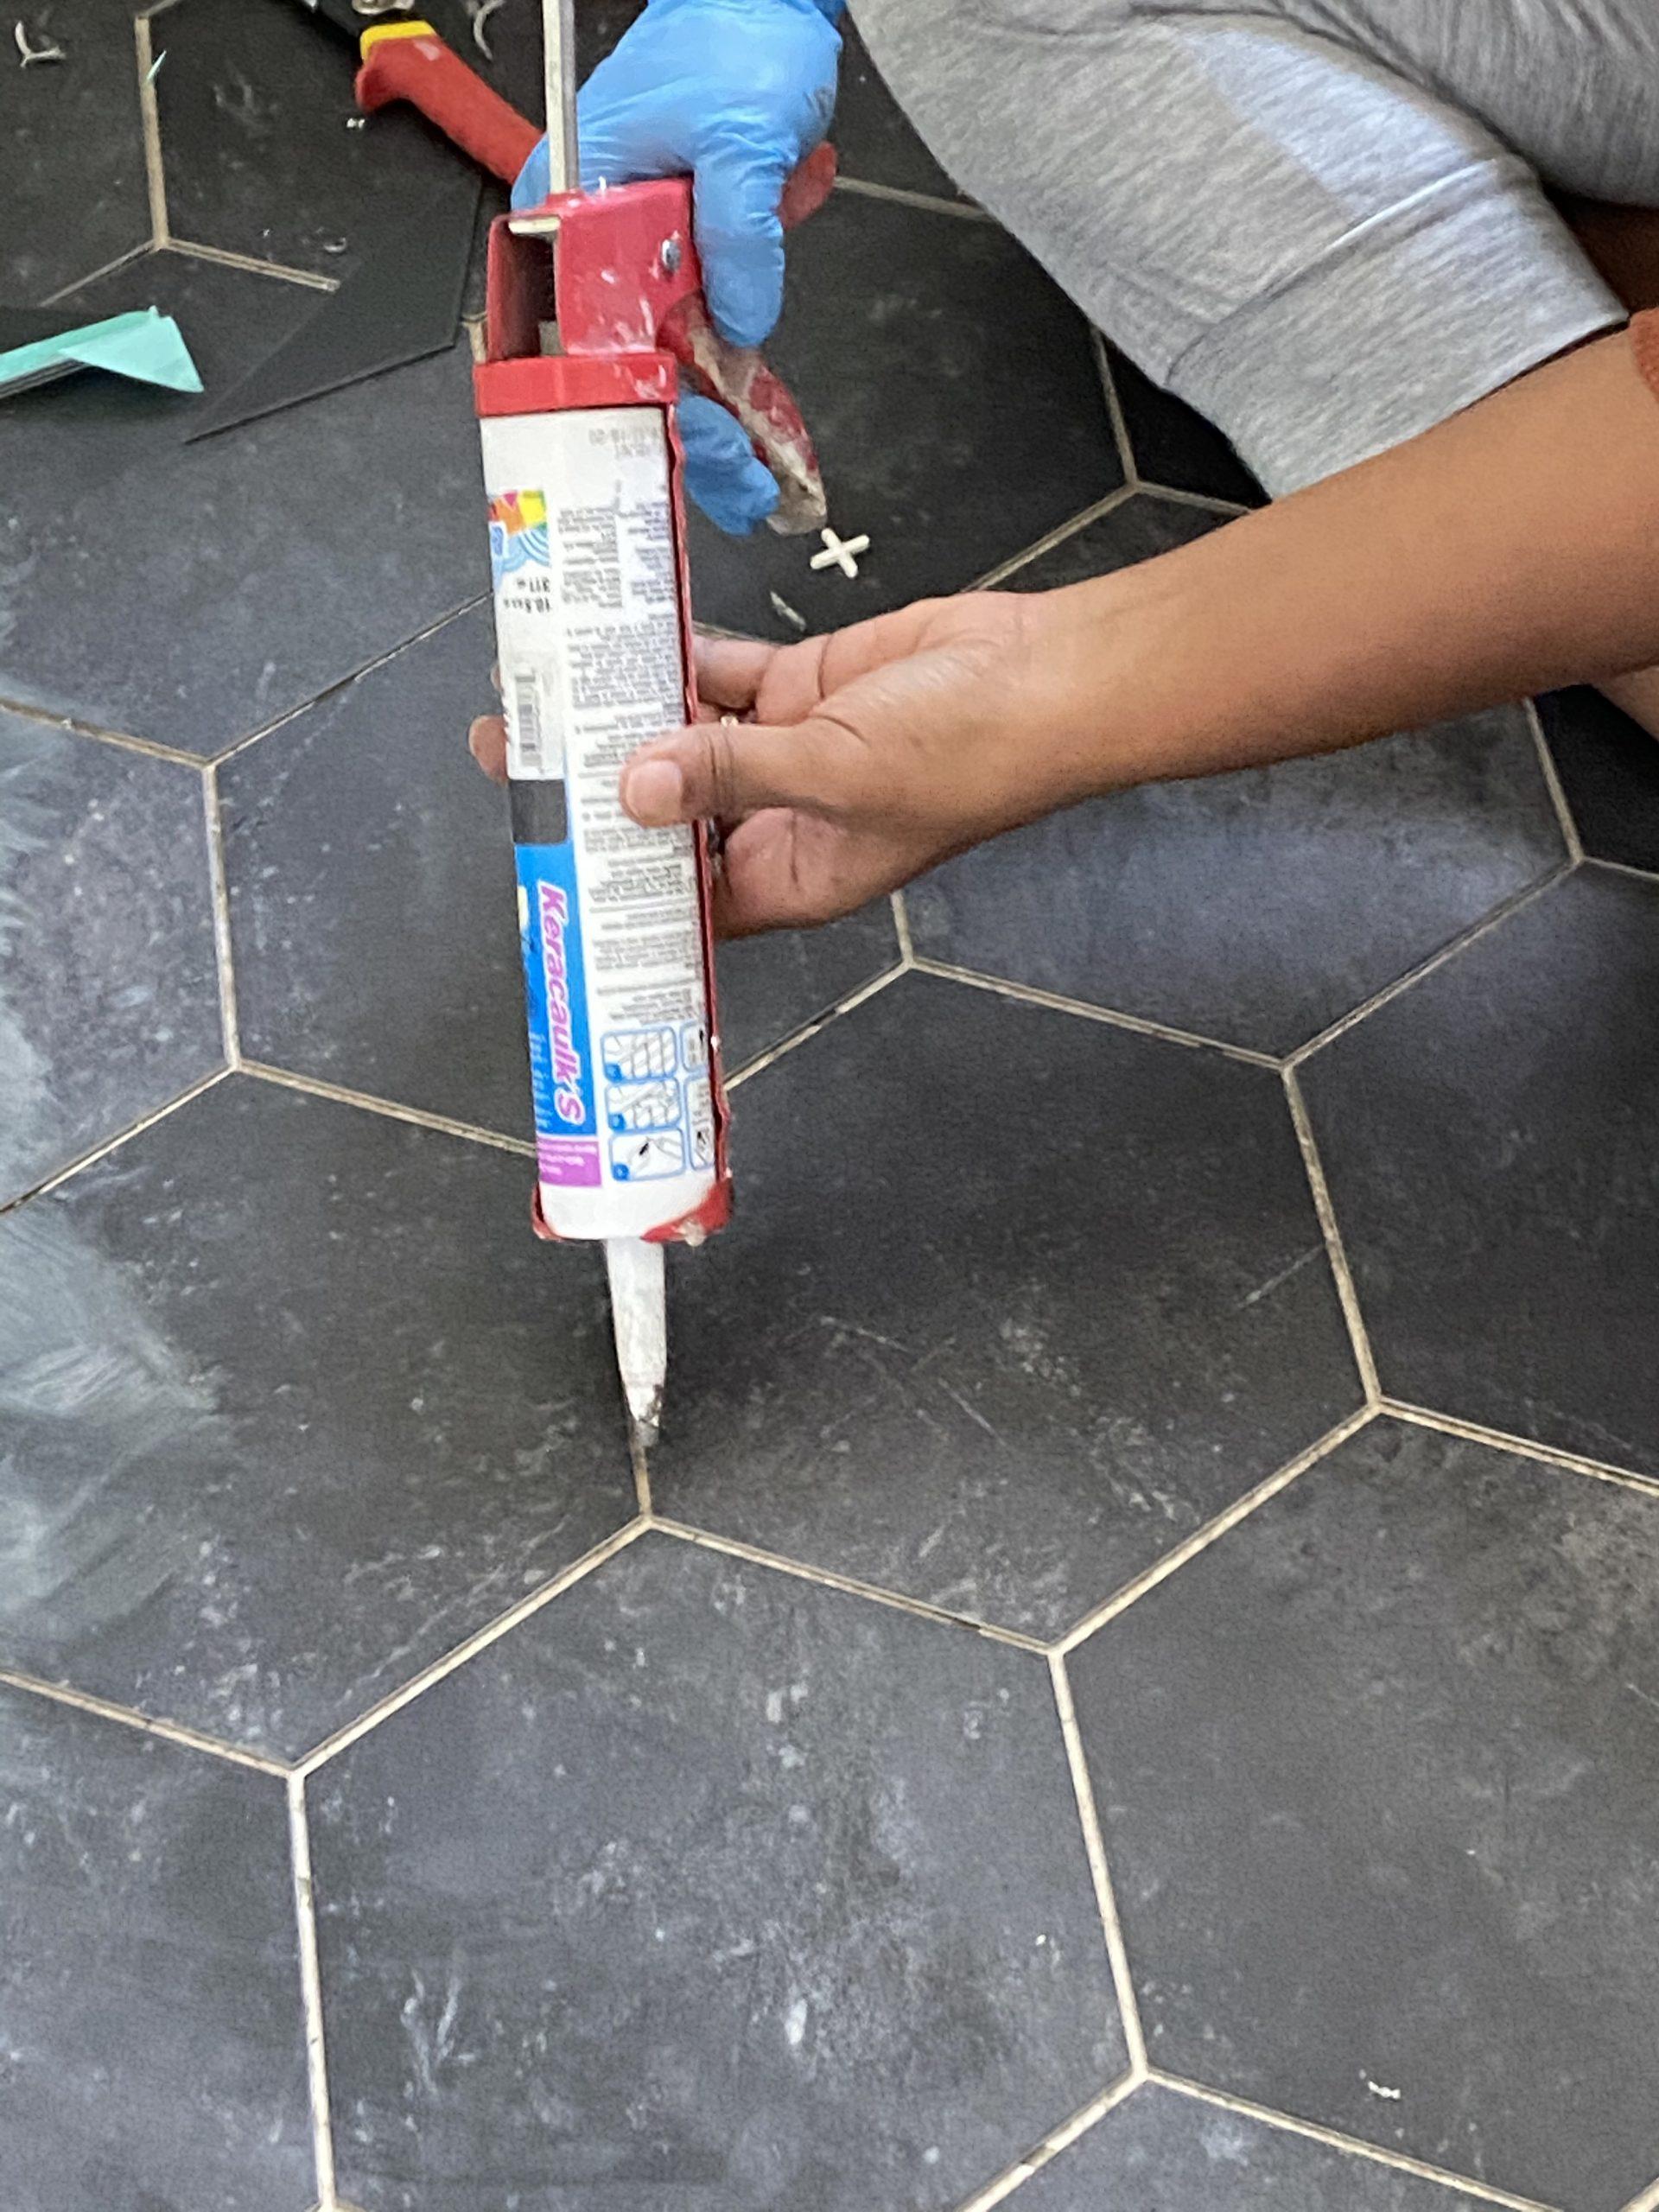 Groutable Tile Over Ceramic, Groutable Vinyl Tile In Bathroom